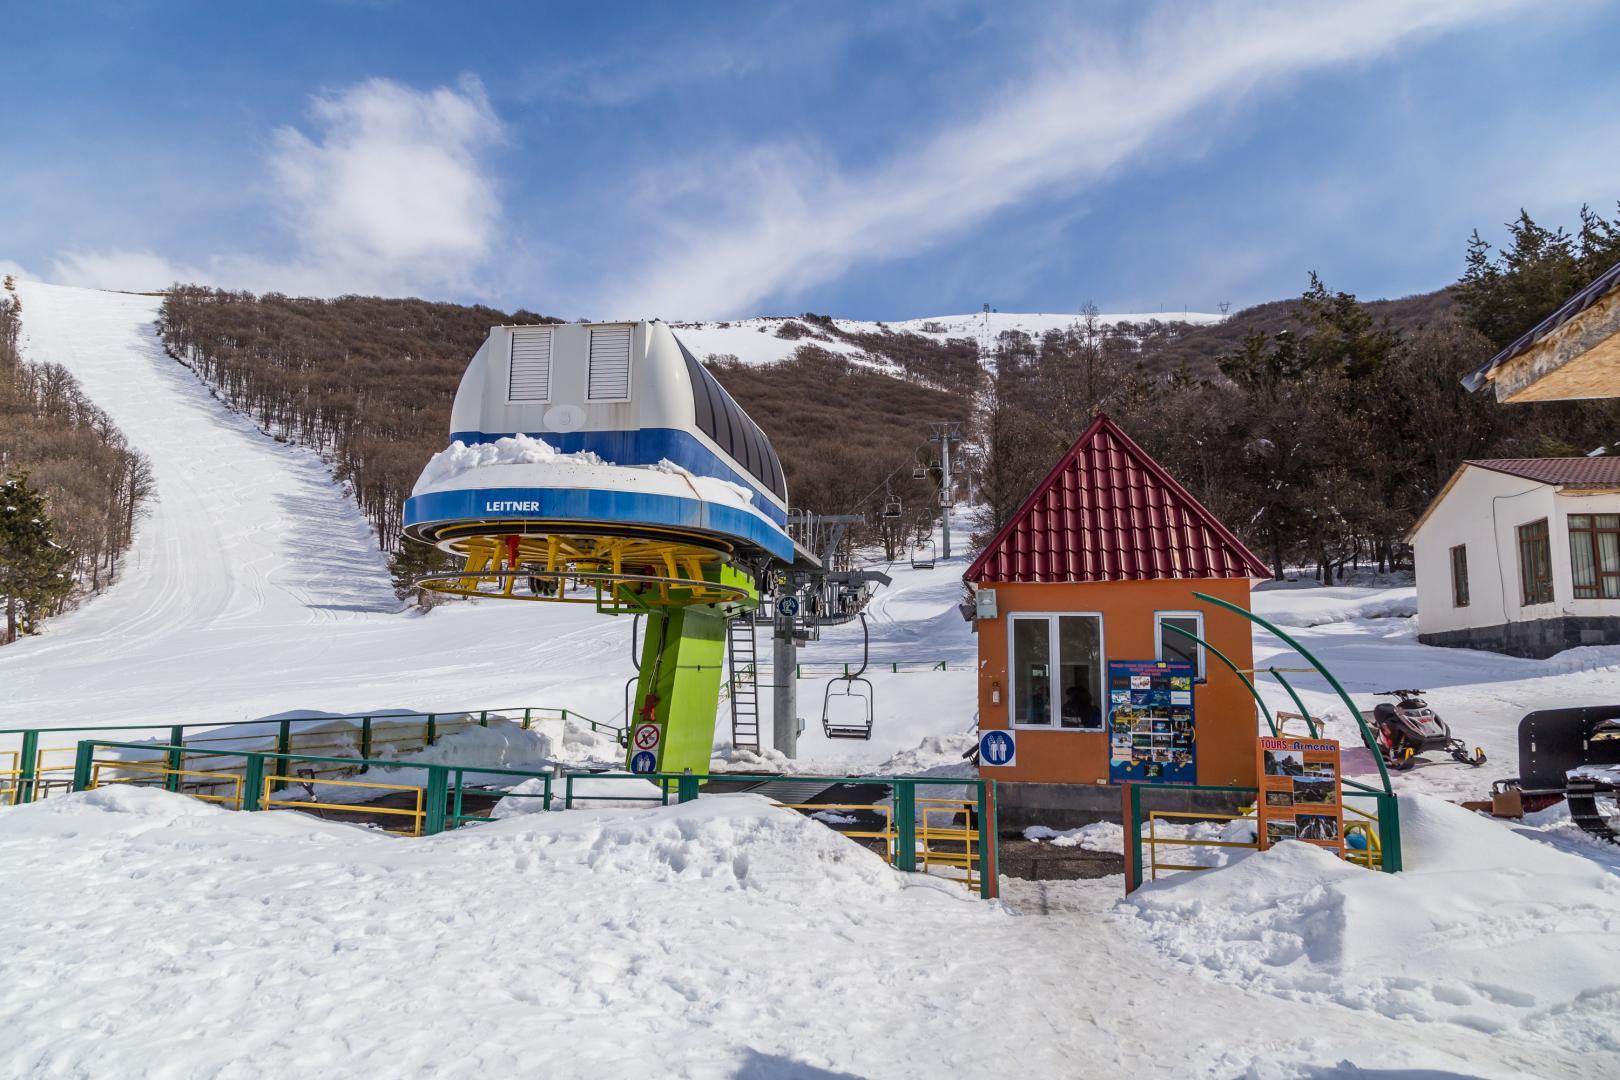 https://www.ski.ru/kohana/upload/ckfinder_images/u83470/images/IMG_0664.jpg